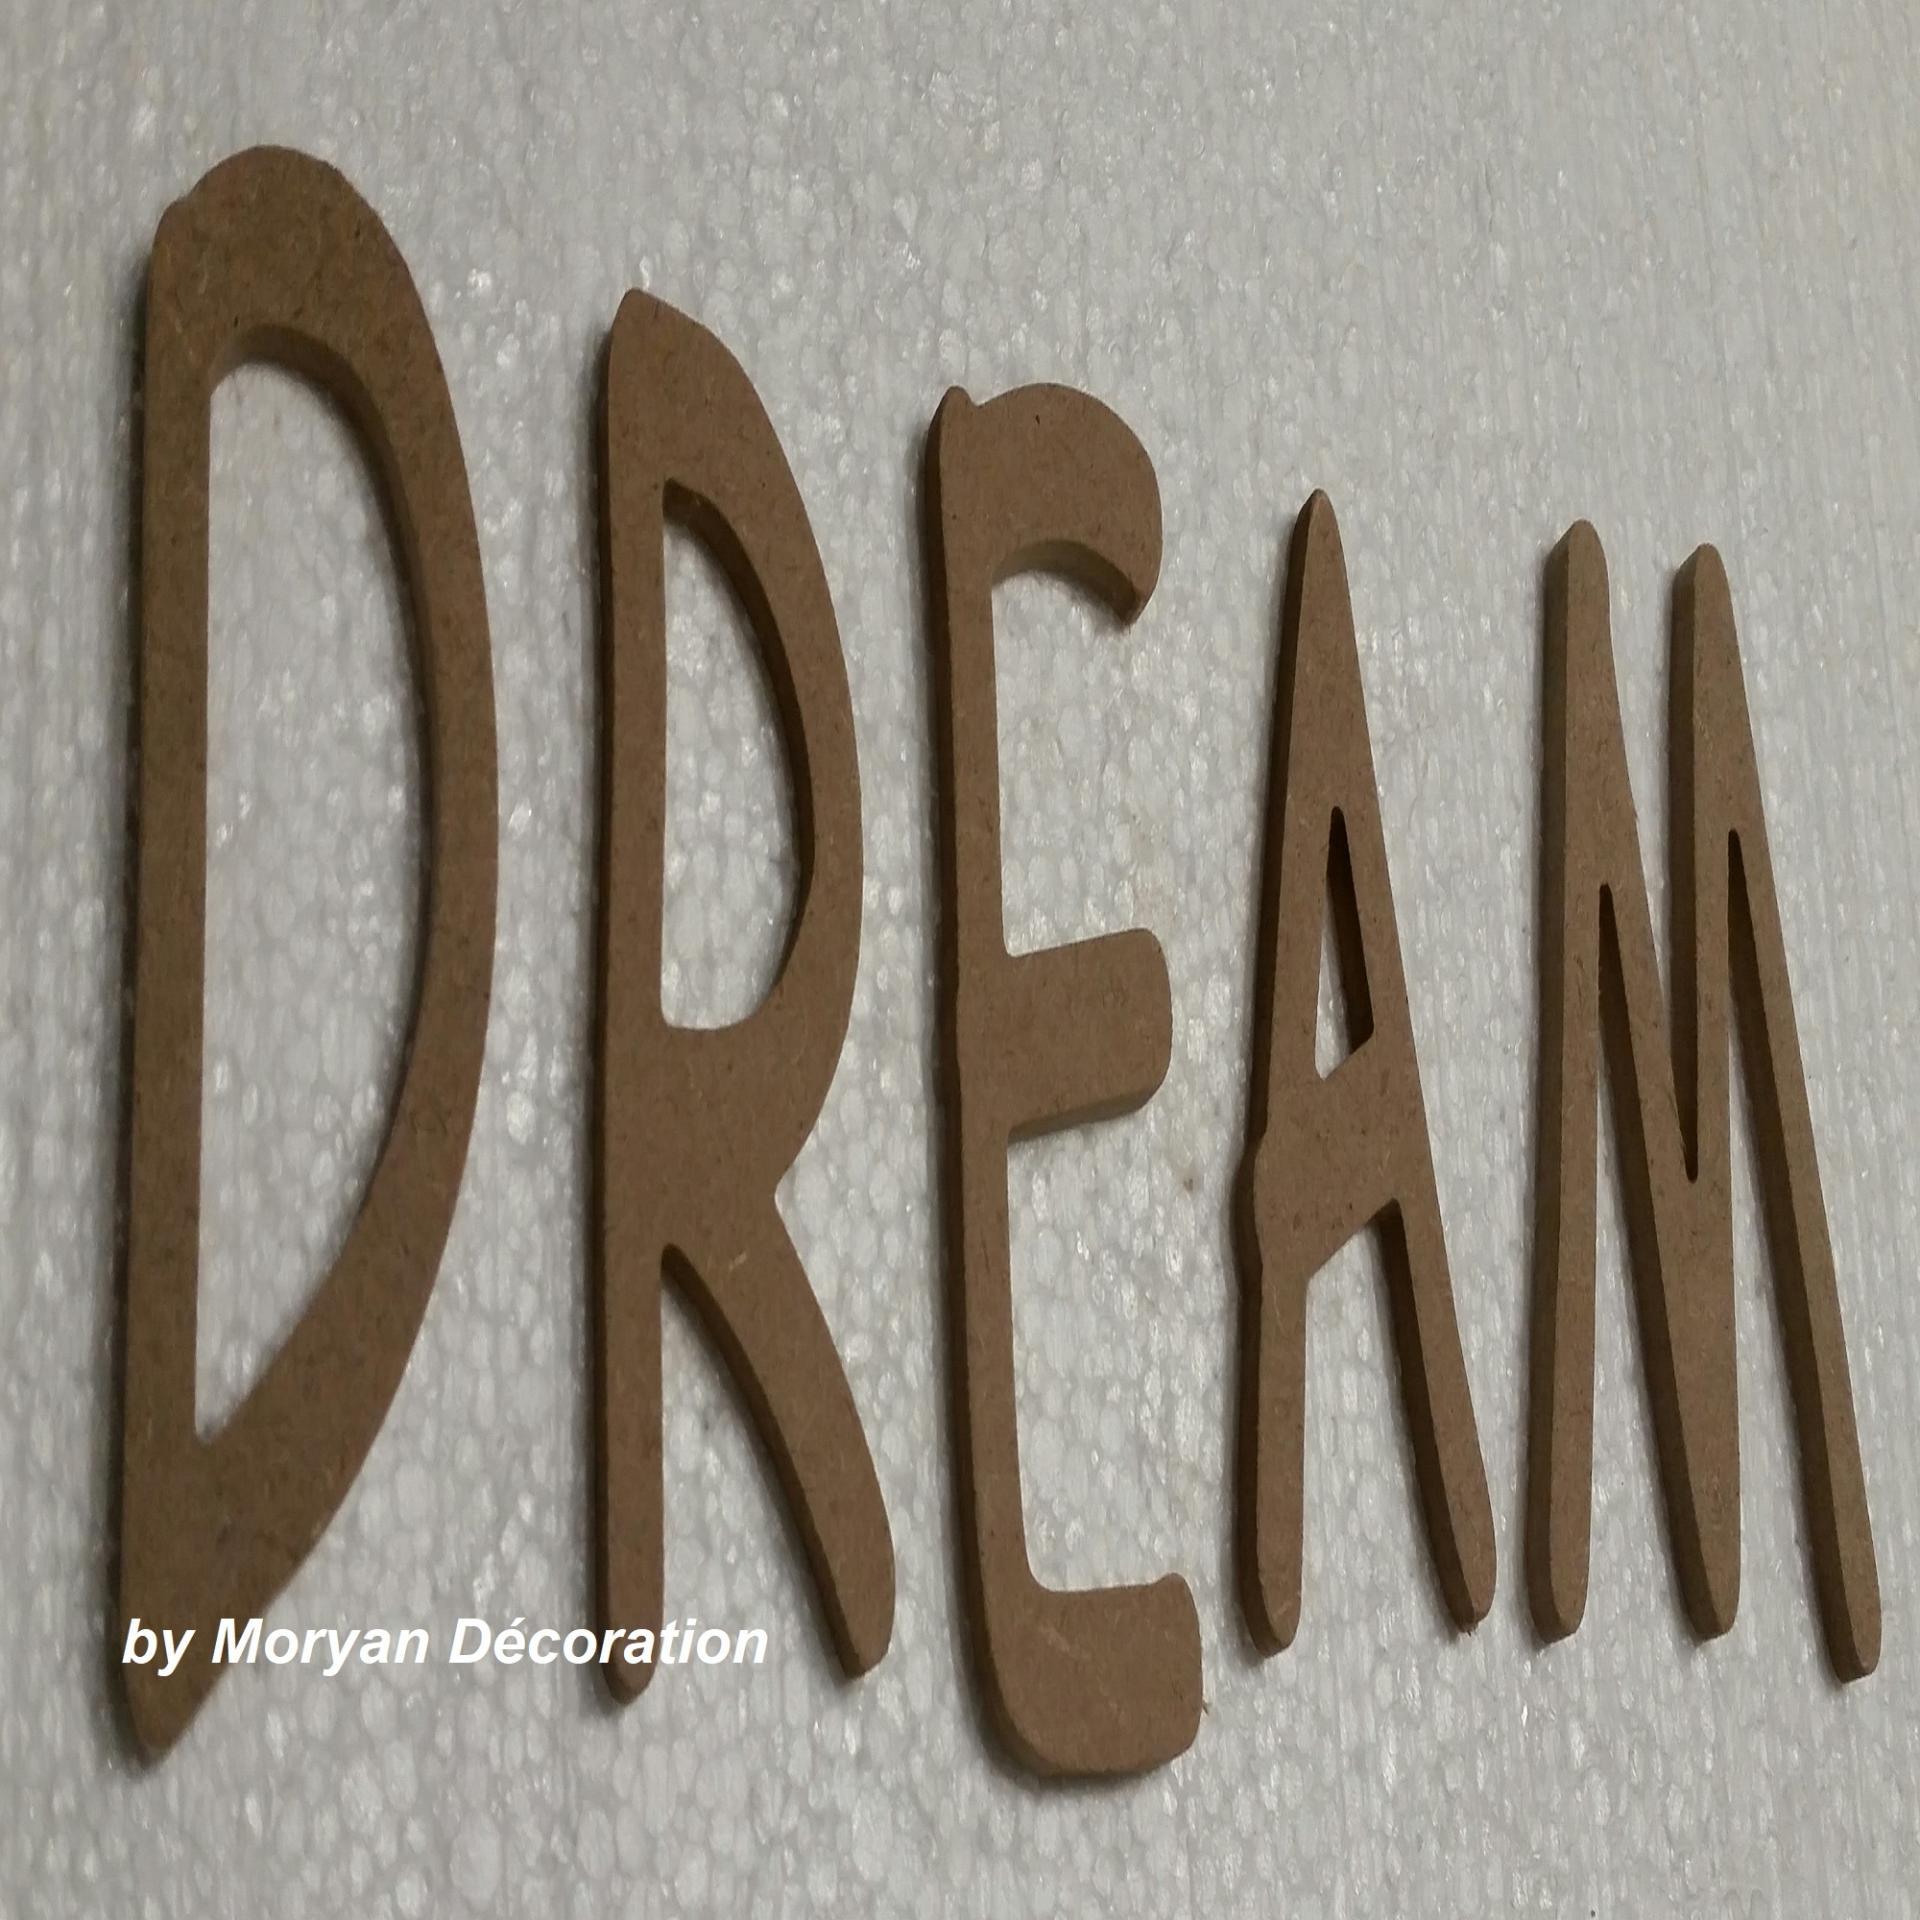 Lettre decorative dream 60 cm